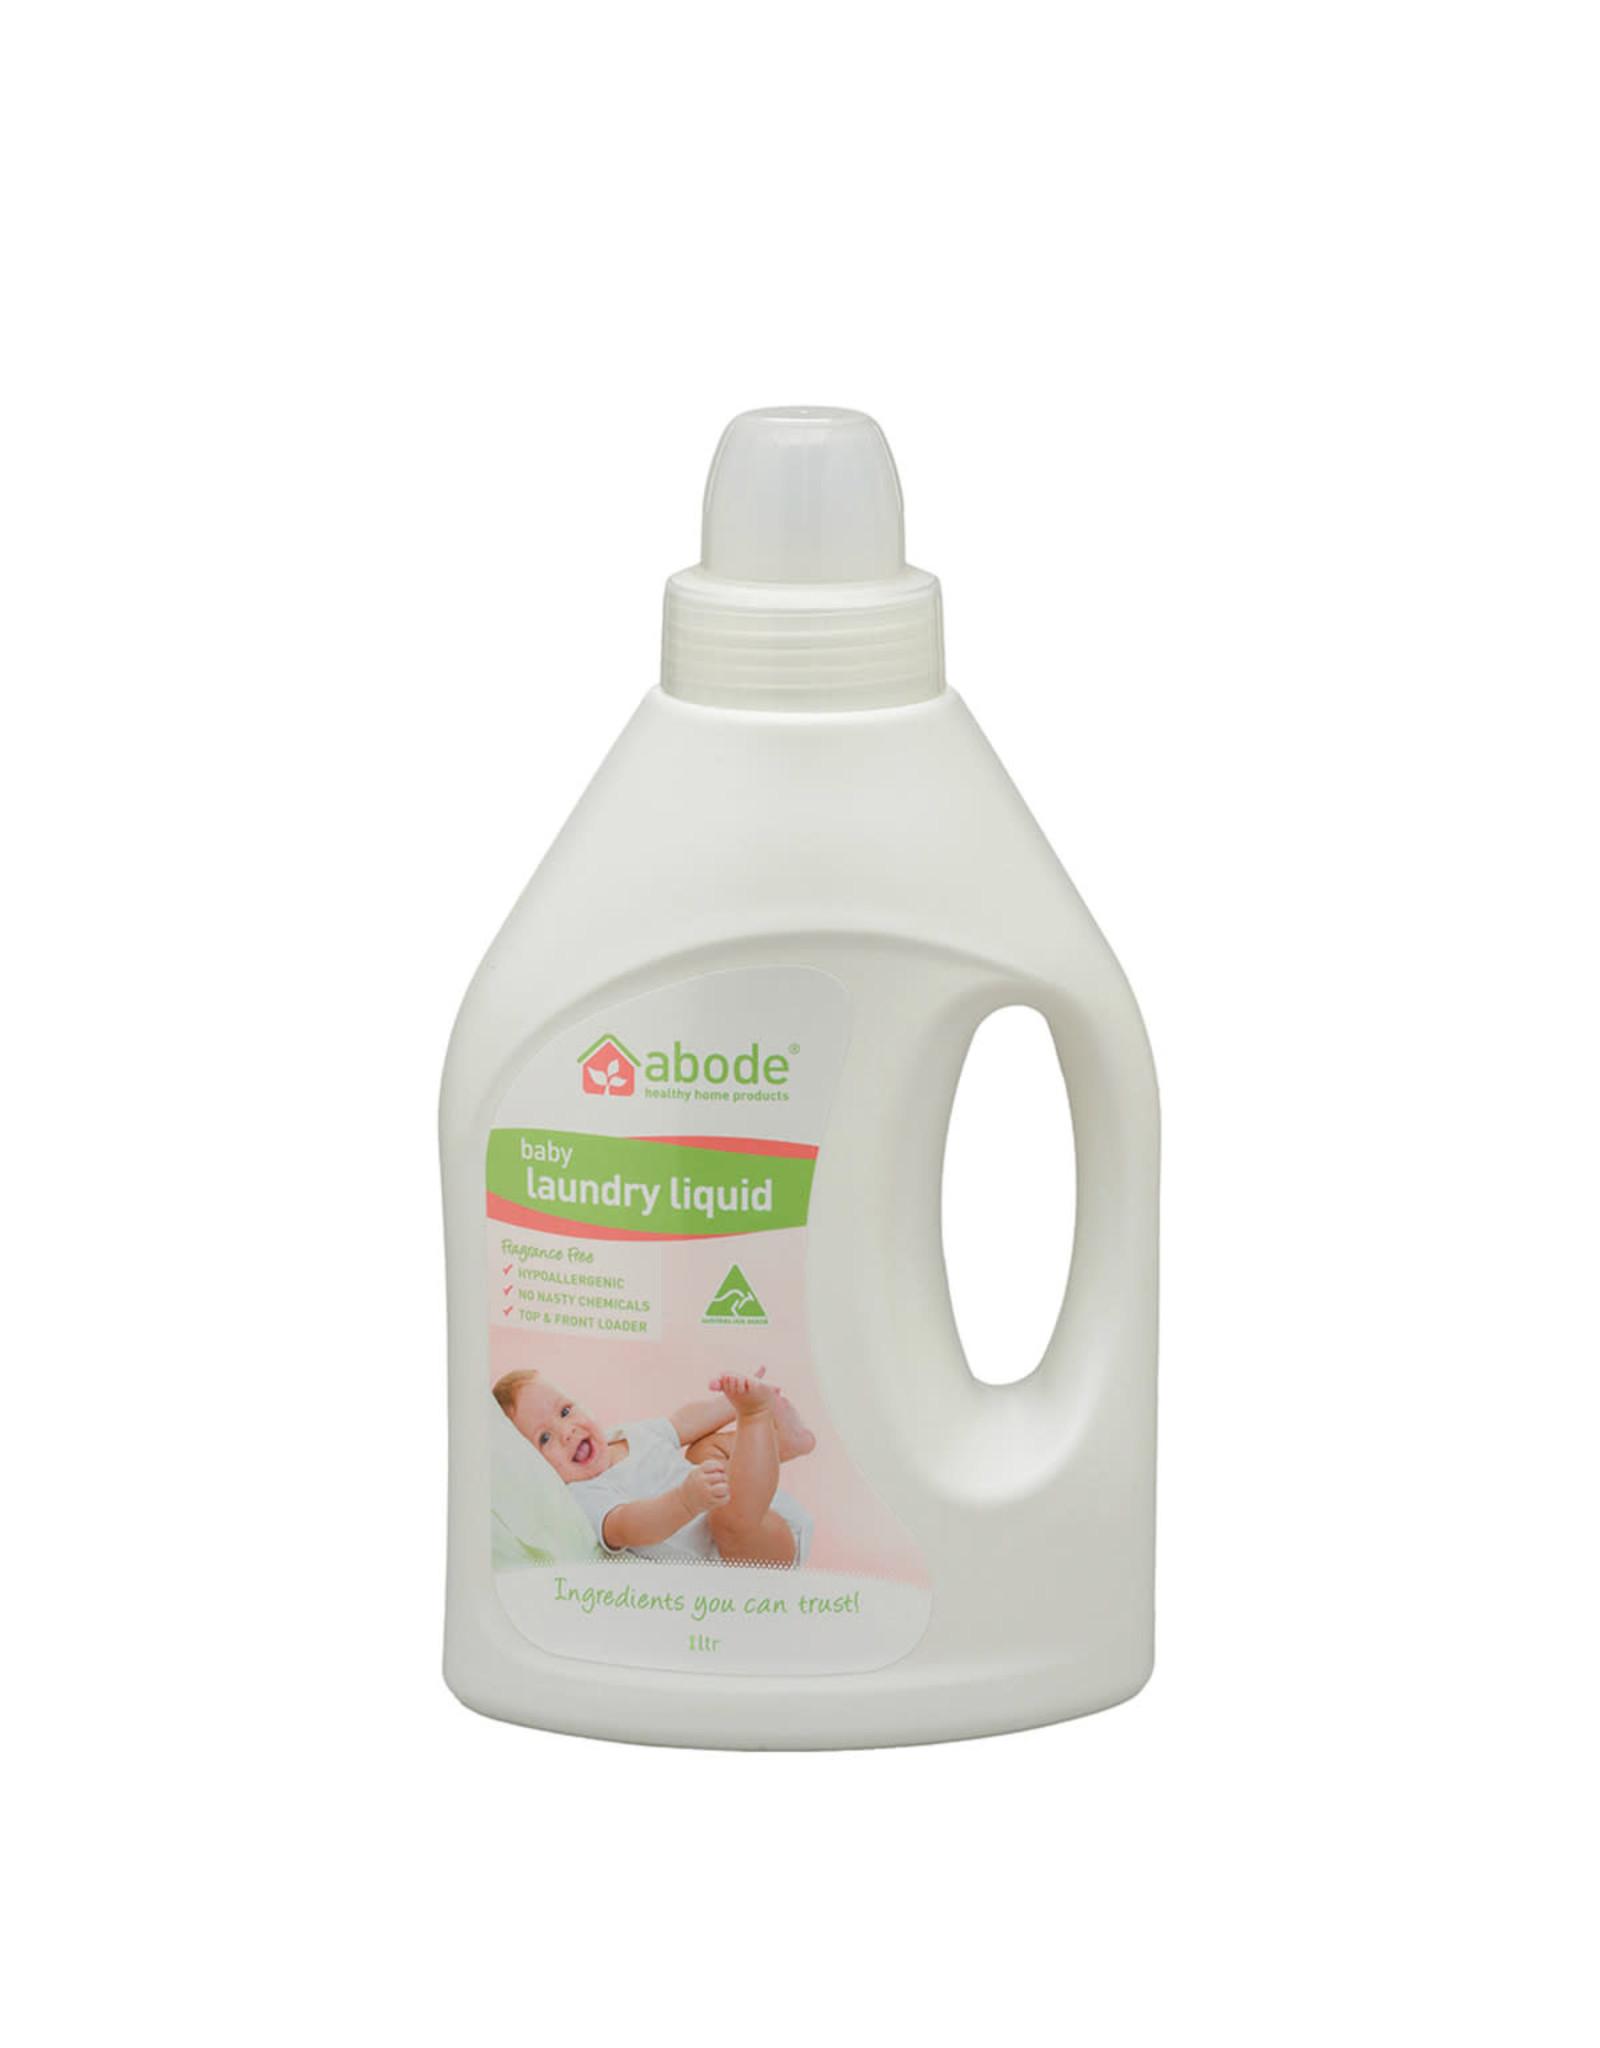 Abode Laundry Liquid Baby